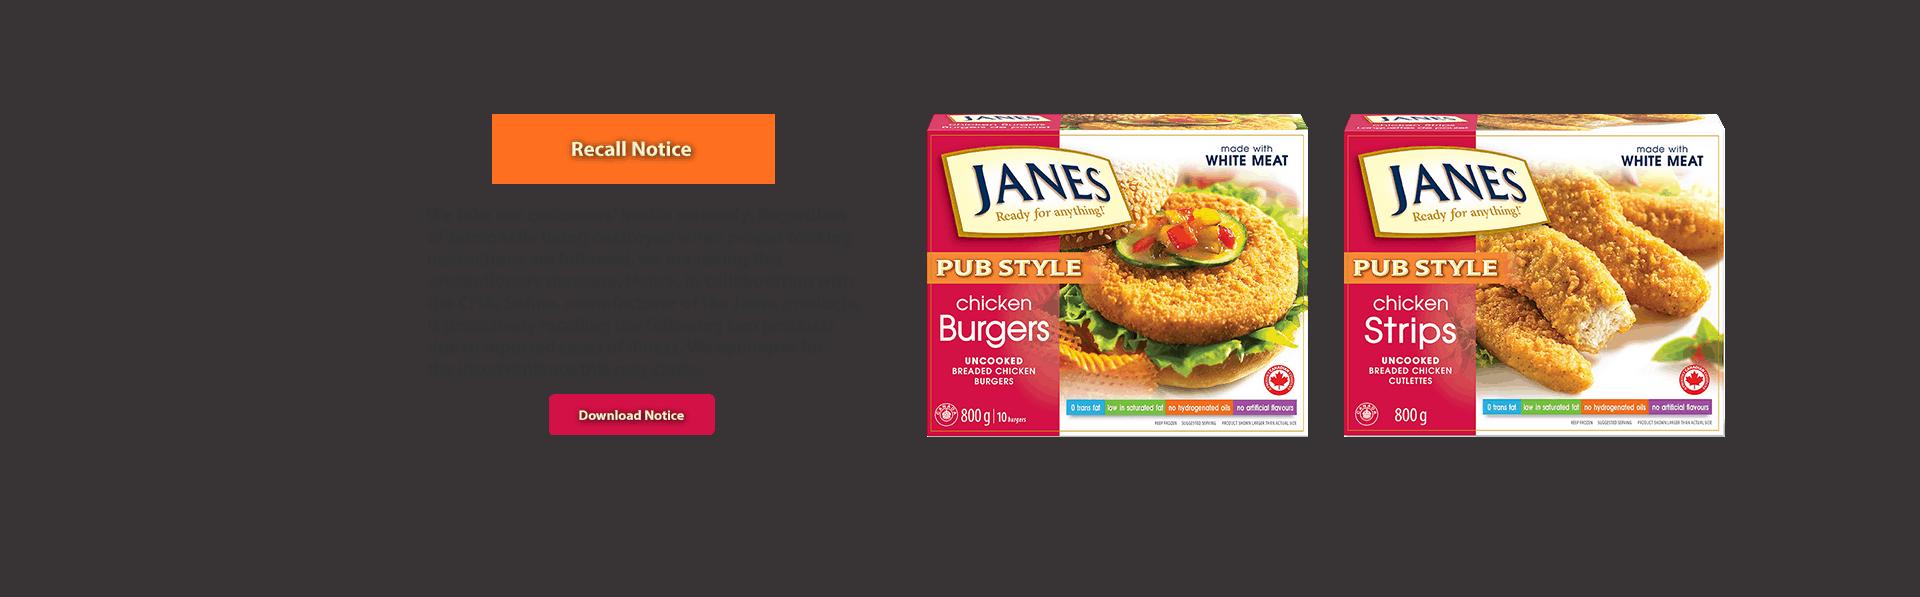 Janes Recall Notice